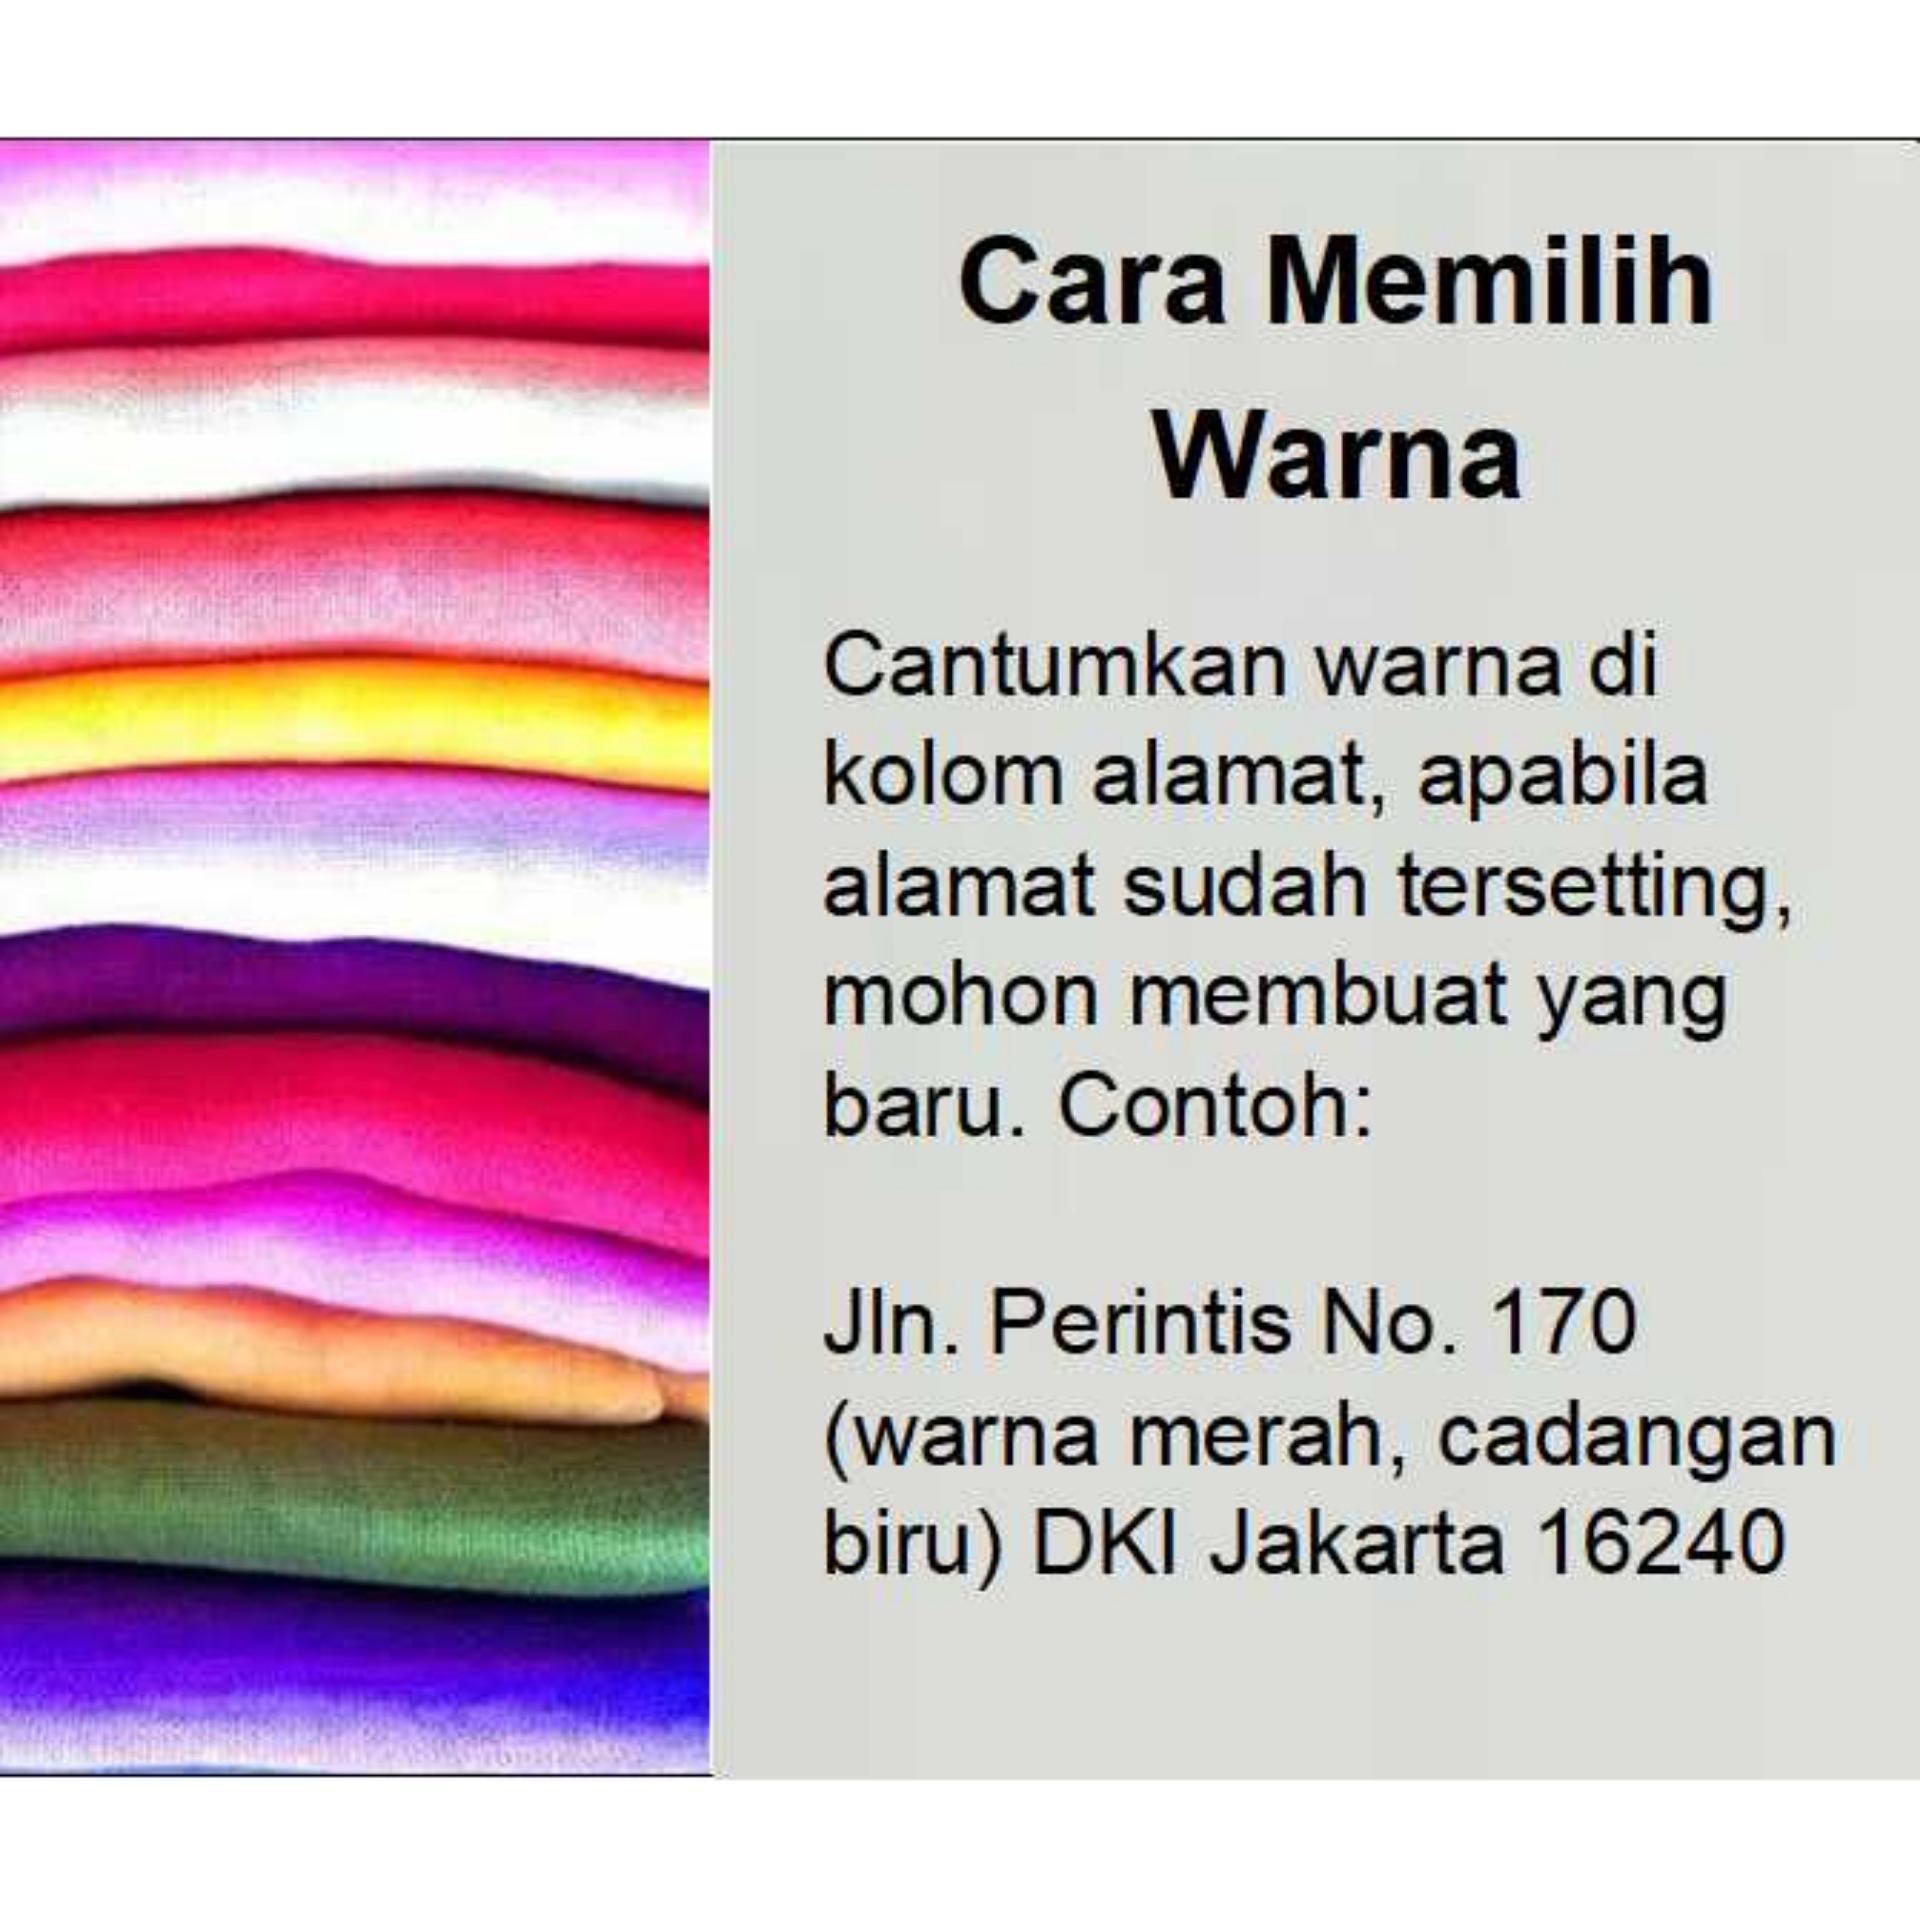 Perbandingan Harga Premium Hijab Impor Jilbab Instan Lcb Najwa Kaos Katun Tc Biru Instant Khimar Syari